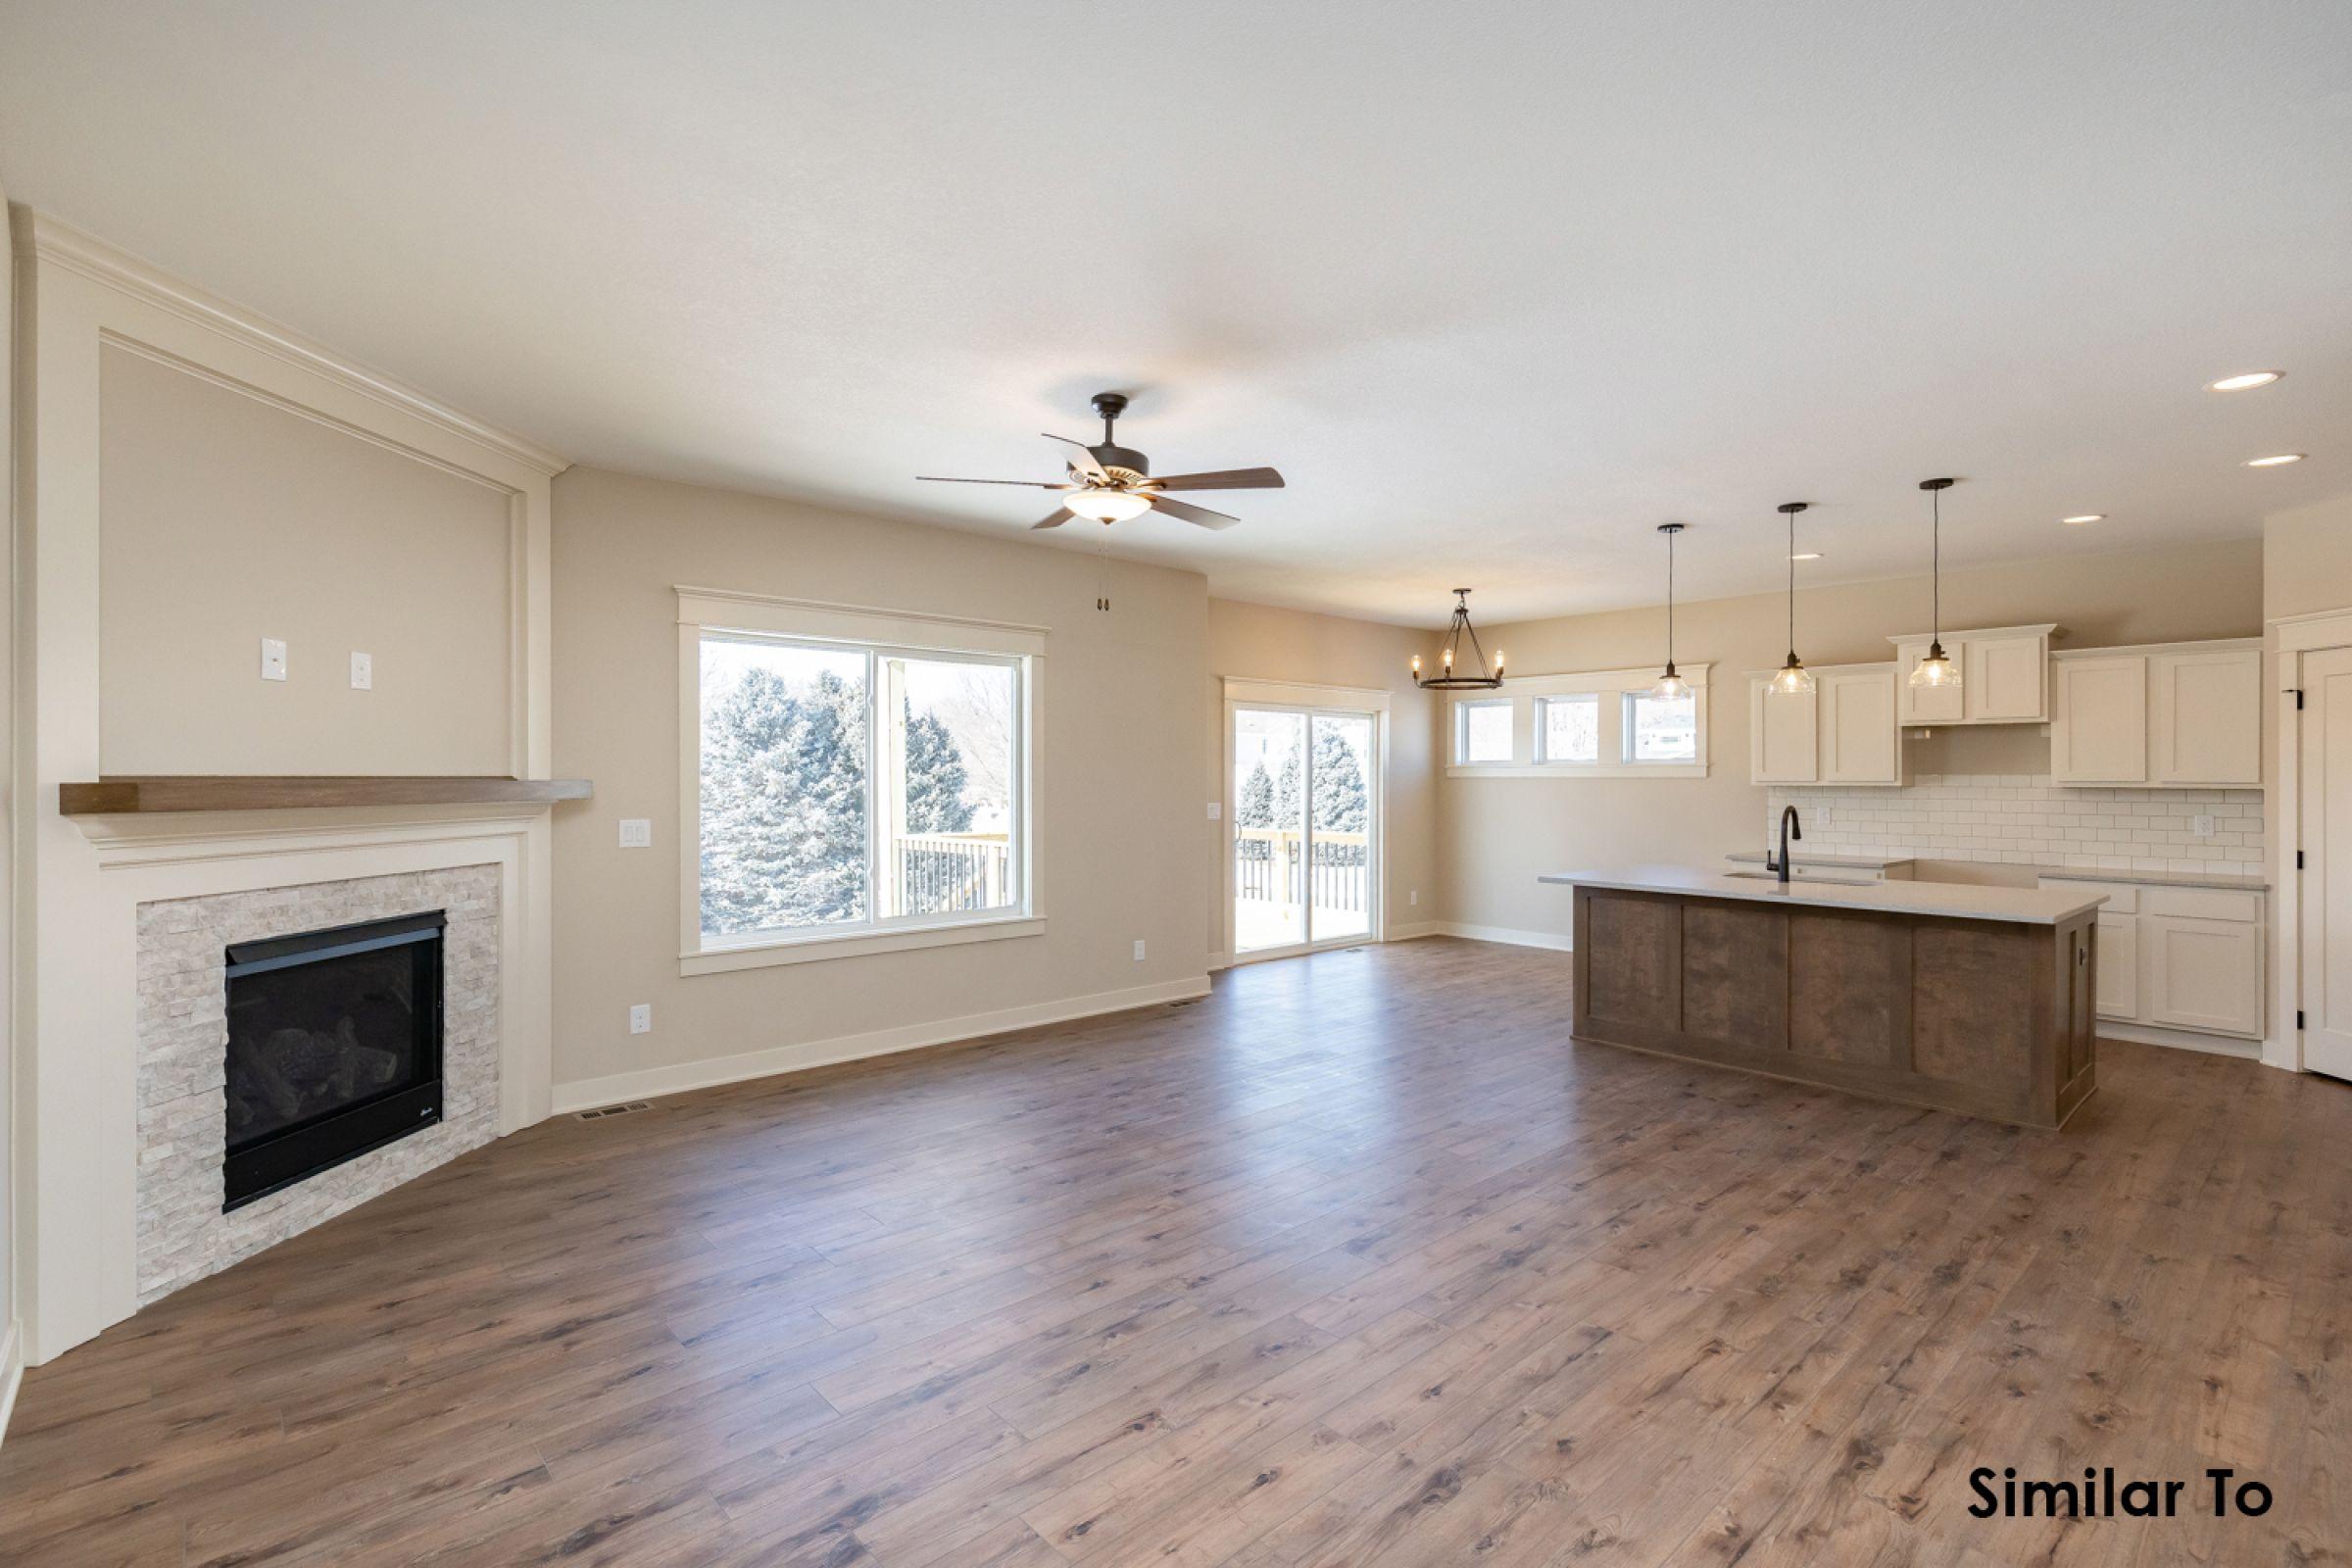 residential-warren-county-iowa-1-acres-listing-number-14995-10-2020-08-03-165351.jpg